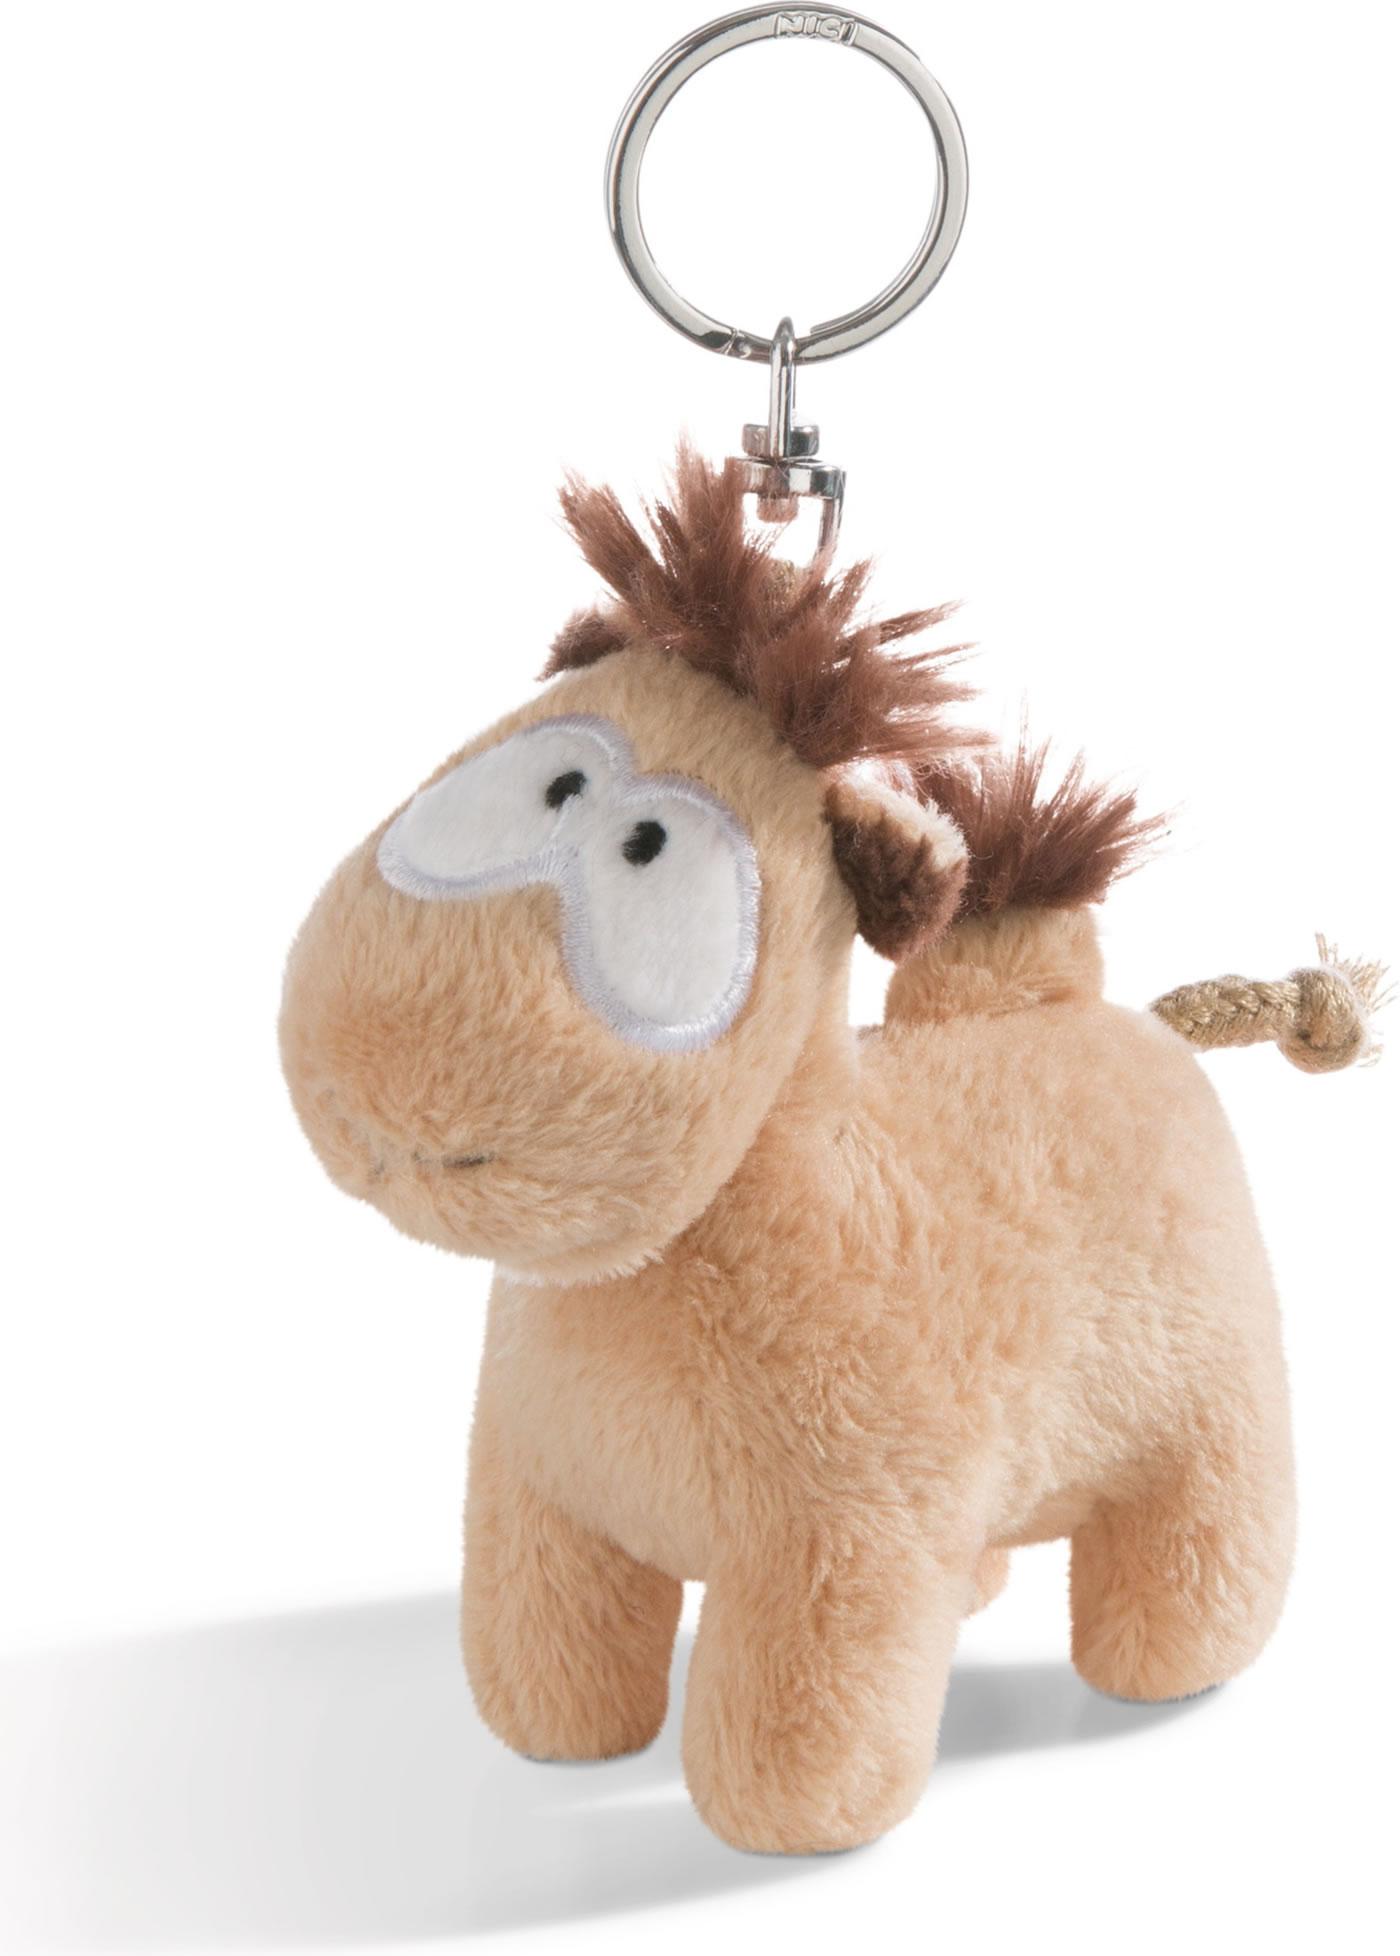 nici schlüsselanhänger kamel kemal 45230 bei papiton